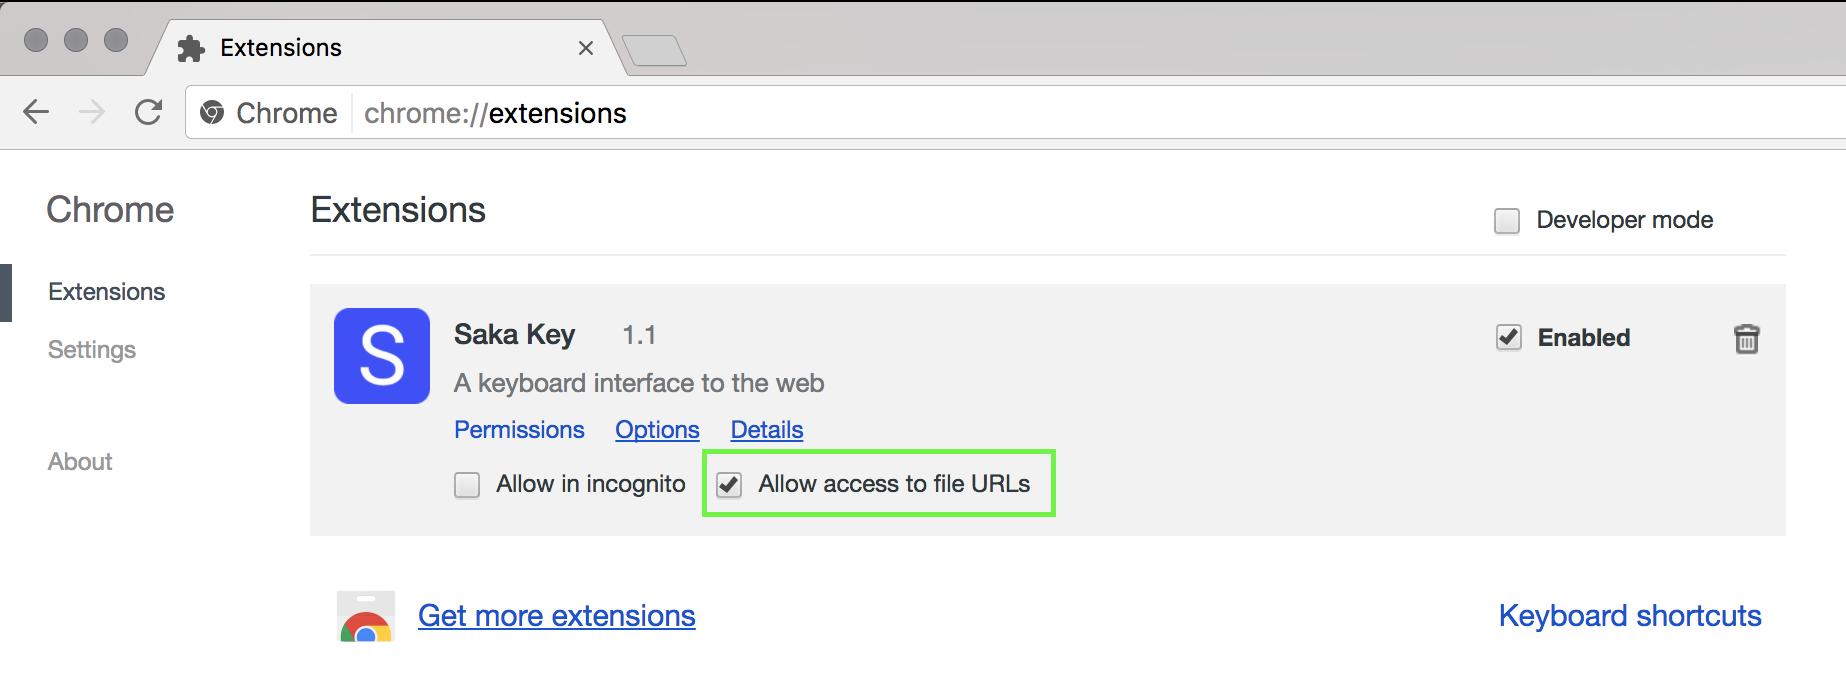 Saka Key on Chrome Extensions Page